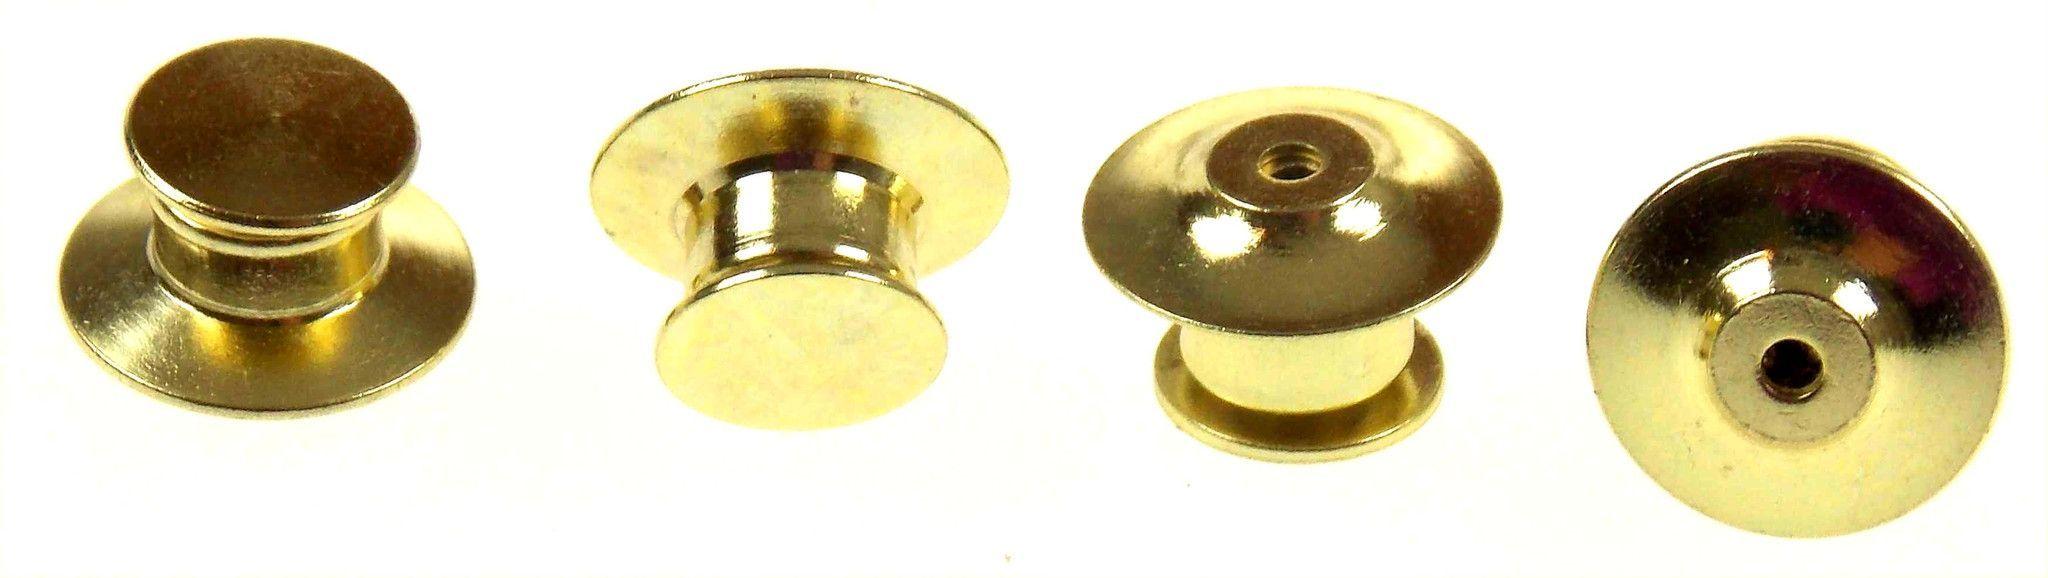 Gold Pin Keeper 6 Dozen 72 Spring Flat Head Brass Lapel Vest